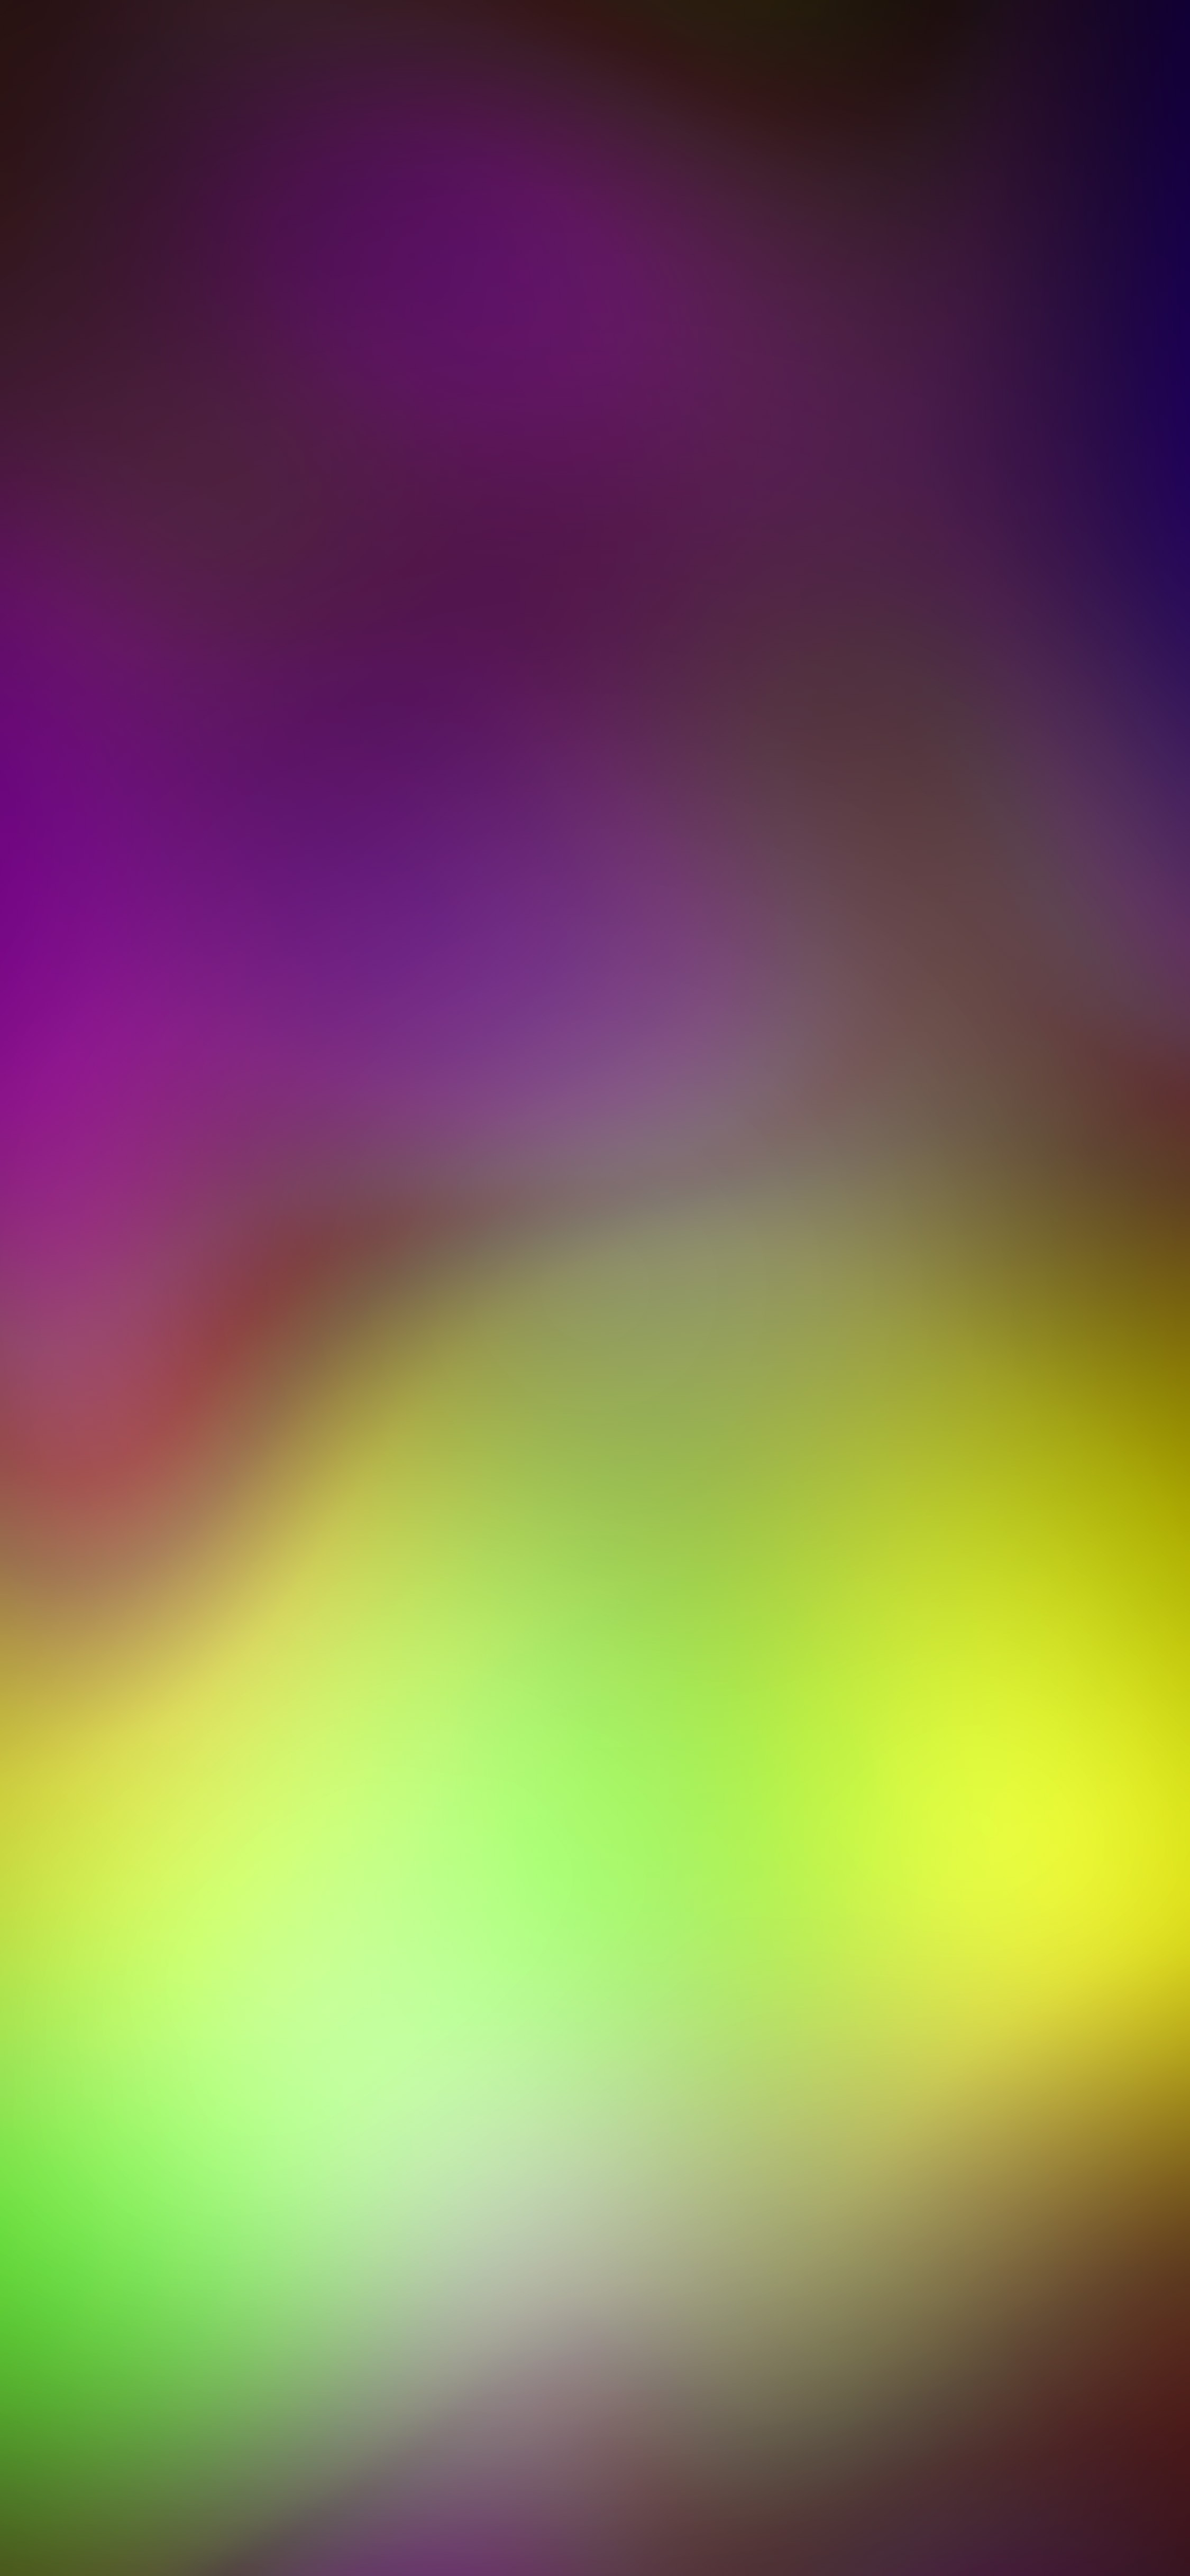 iPhone X Wallpaper 21 - [2250 x 4872]